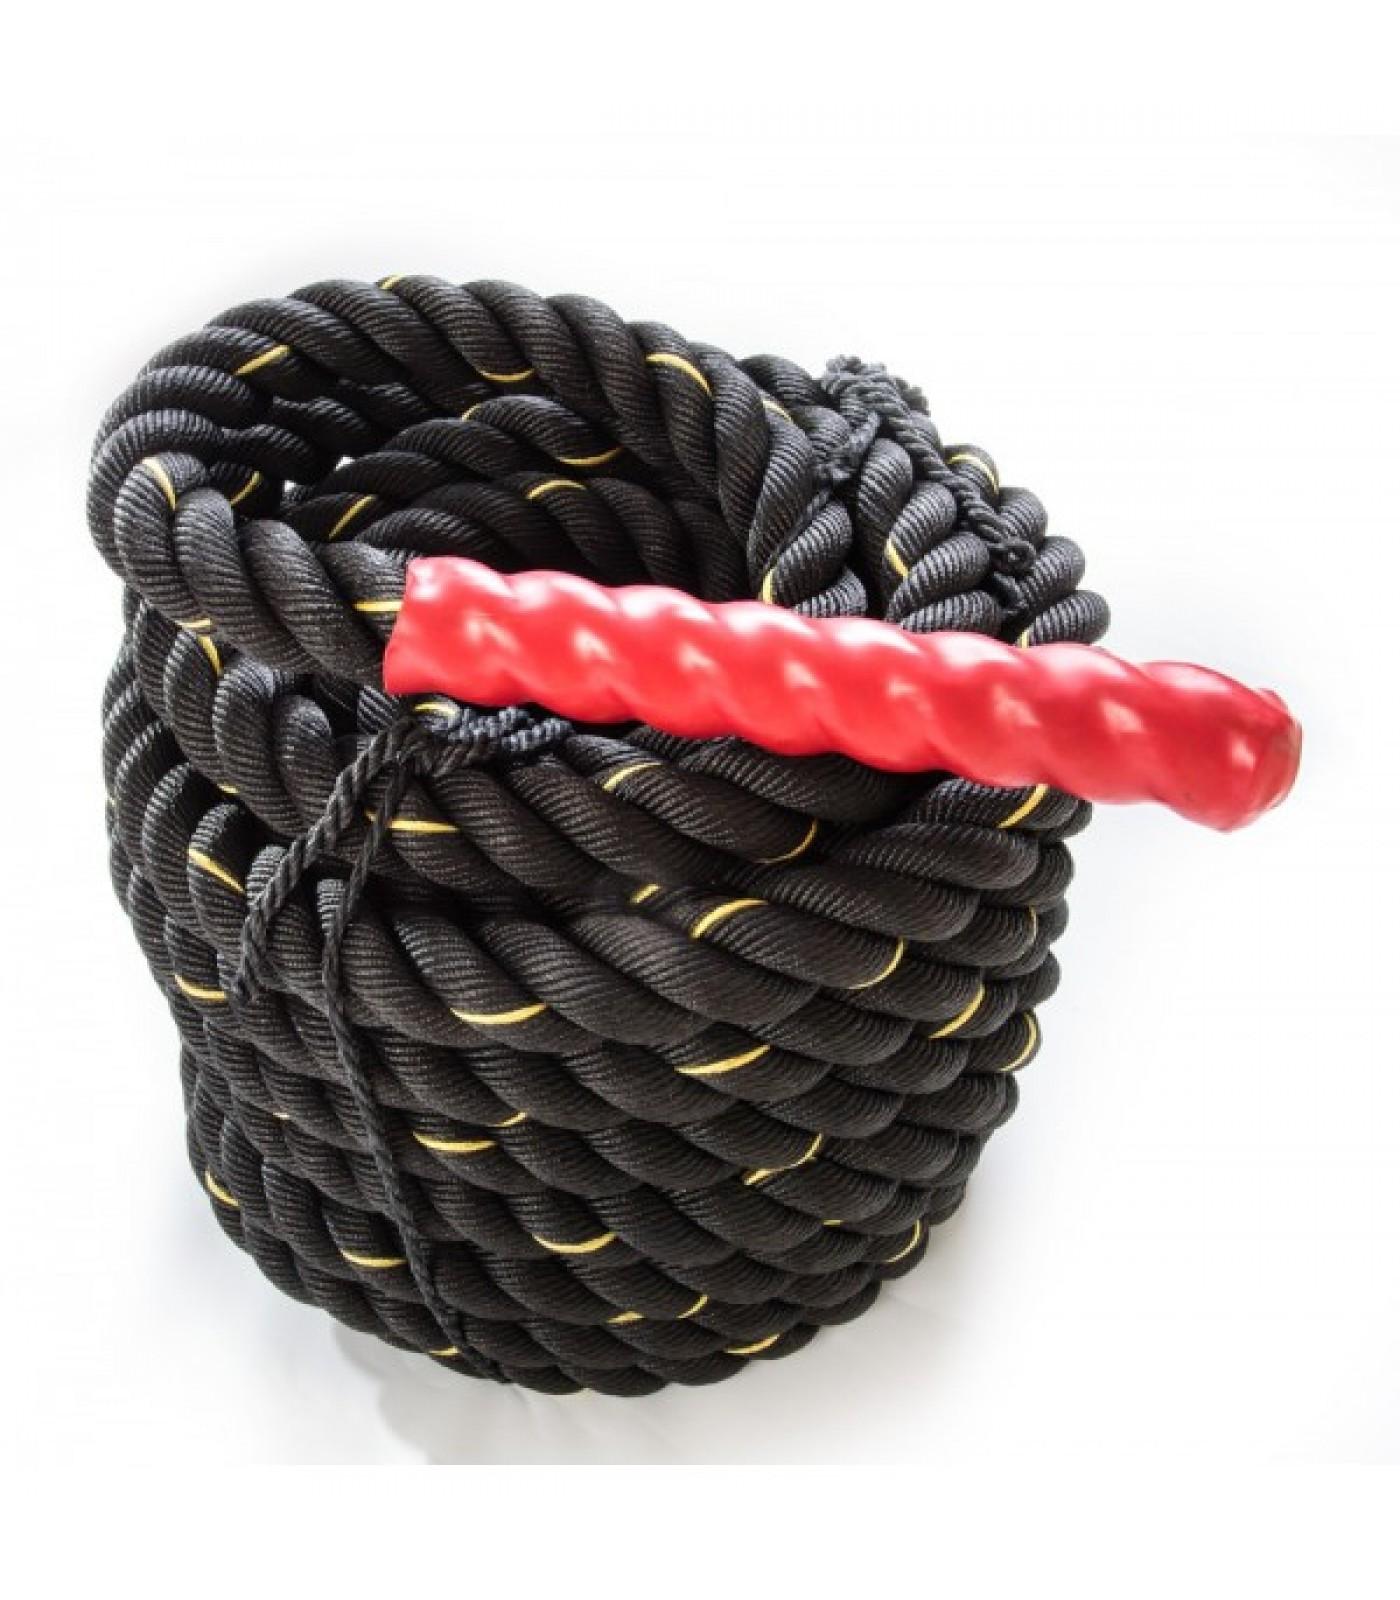 SZ Fighters - Anaconda rope / 15m.